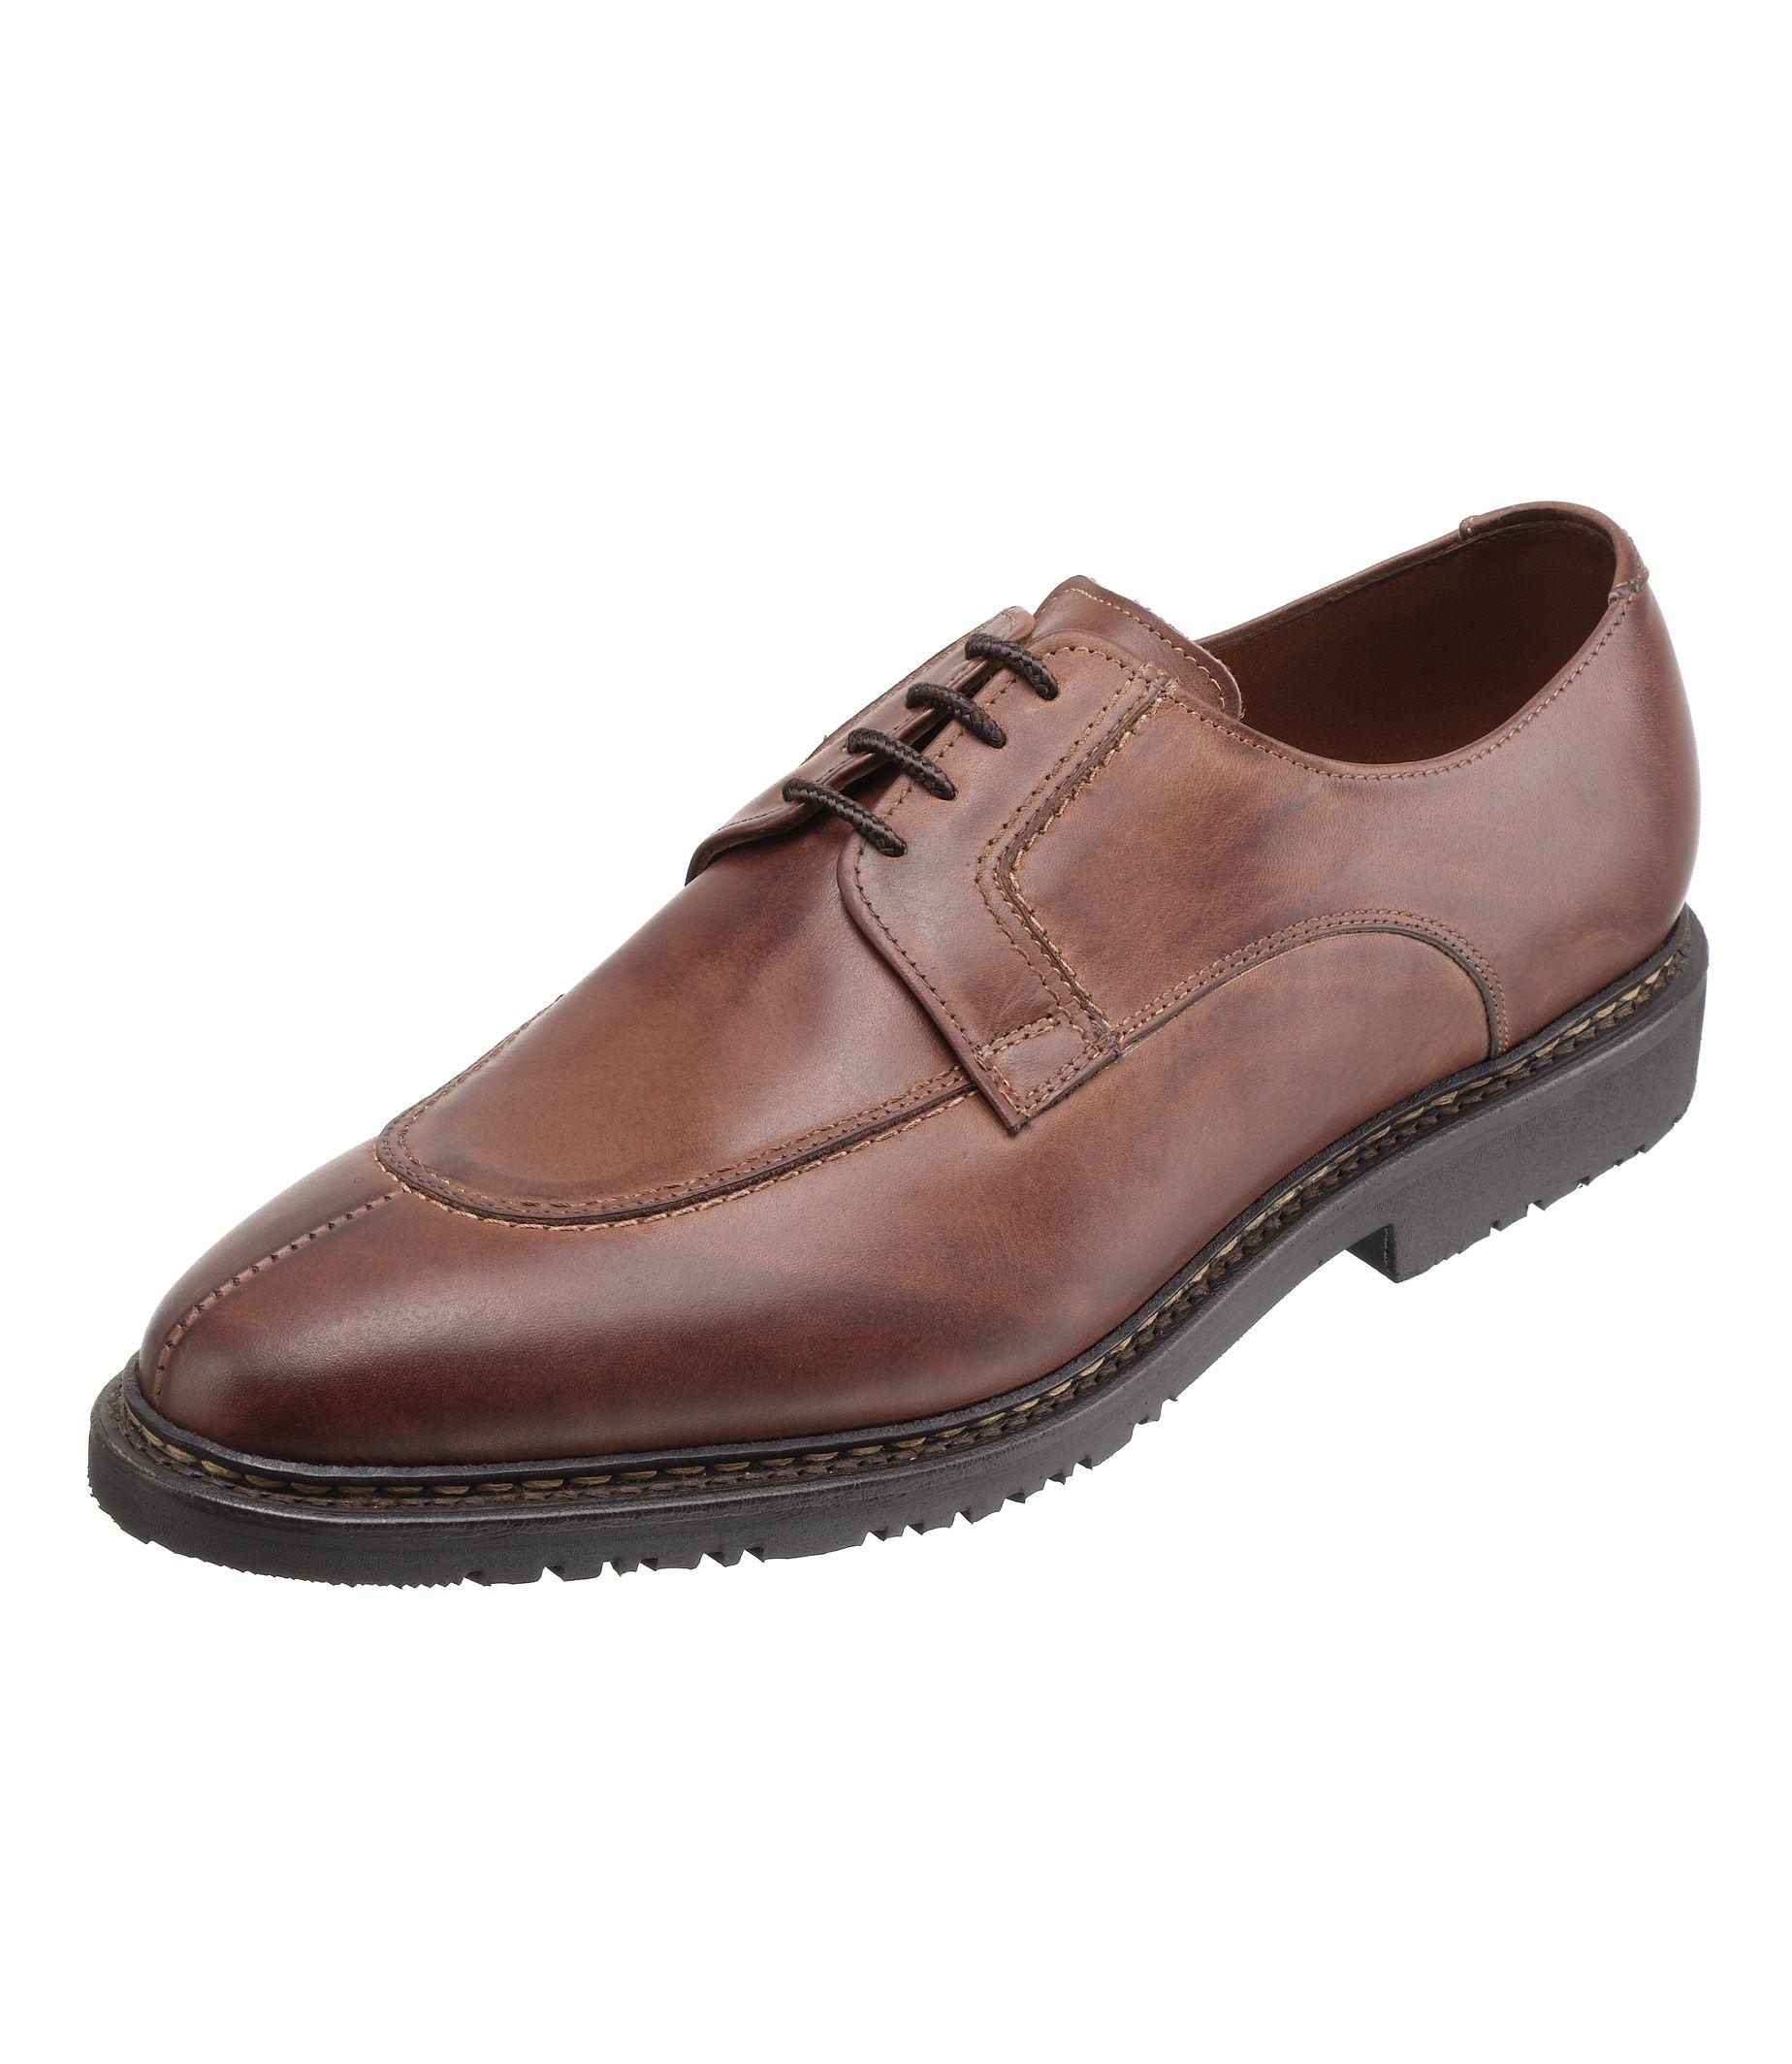 Malone Shoe by Allen Edmonds Men's Shoes